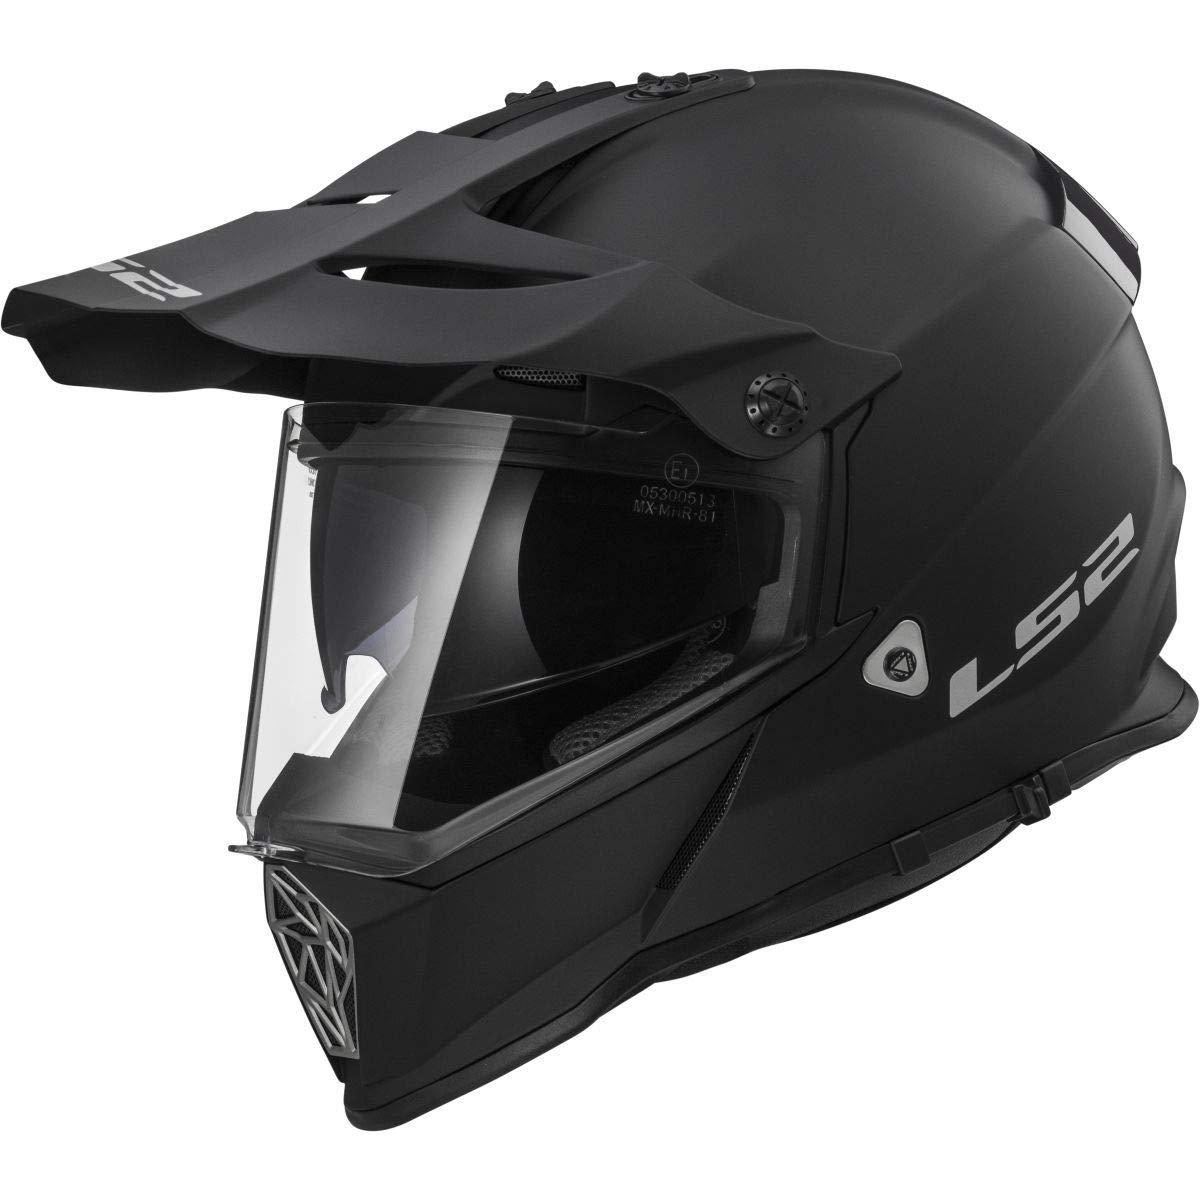 LS2 Helmets Motorcycle /& Powersports Helmets Off-Road Style Adventure Pioneer V2 Matte Black, XX-Large